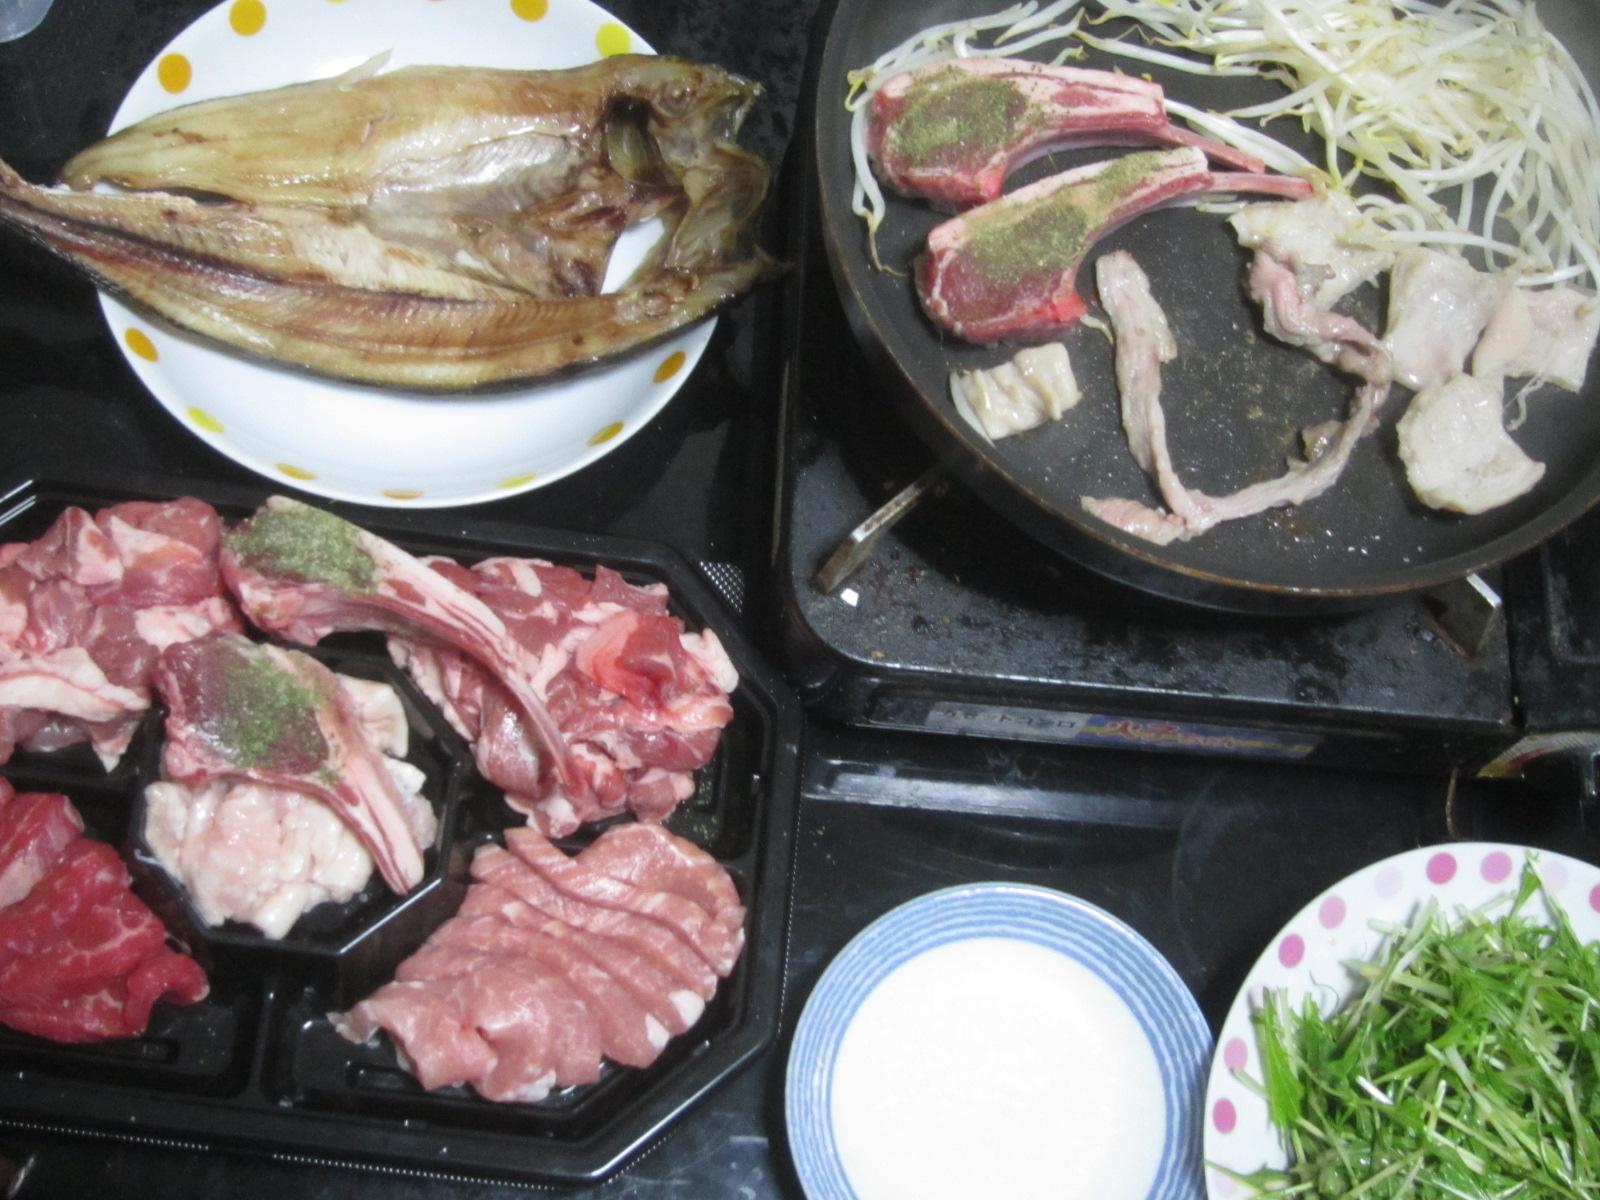 IMG 0113 - 札幌白石区 焼肉平和園 蘭豆Part3